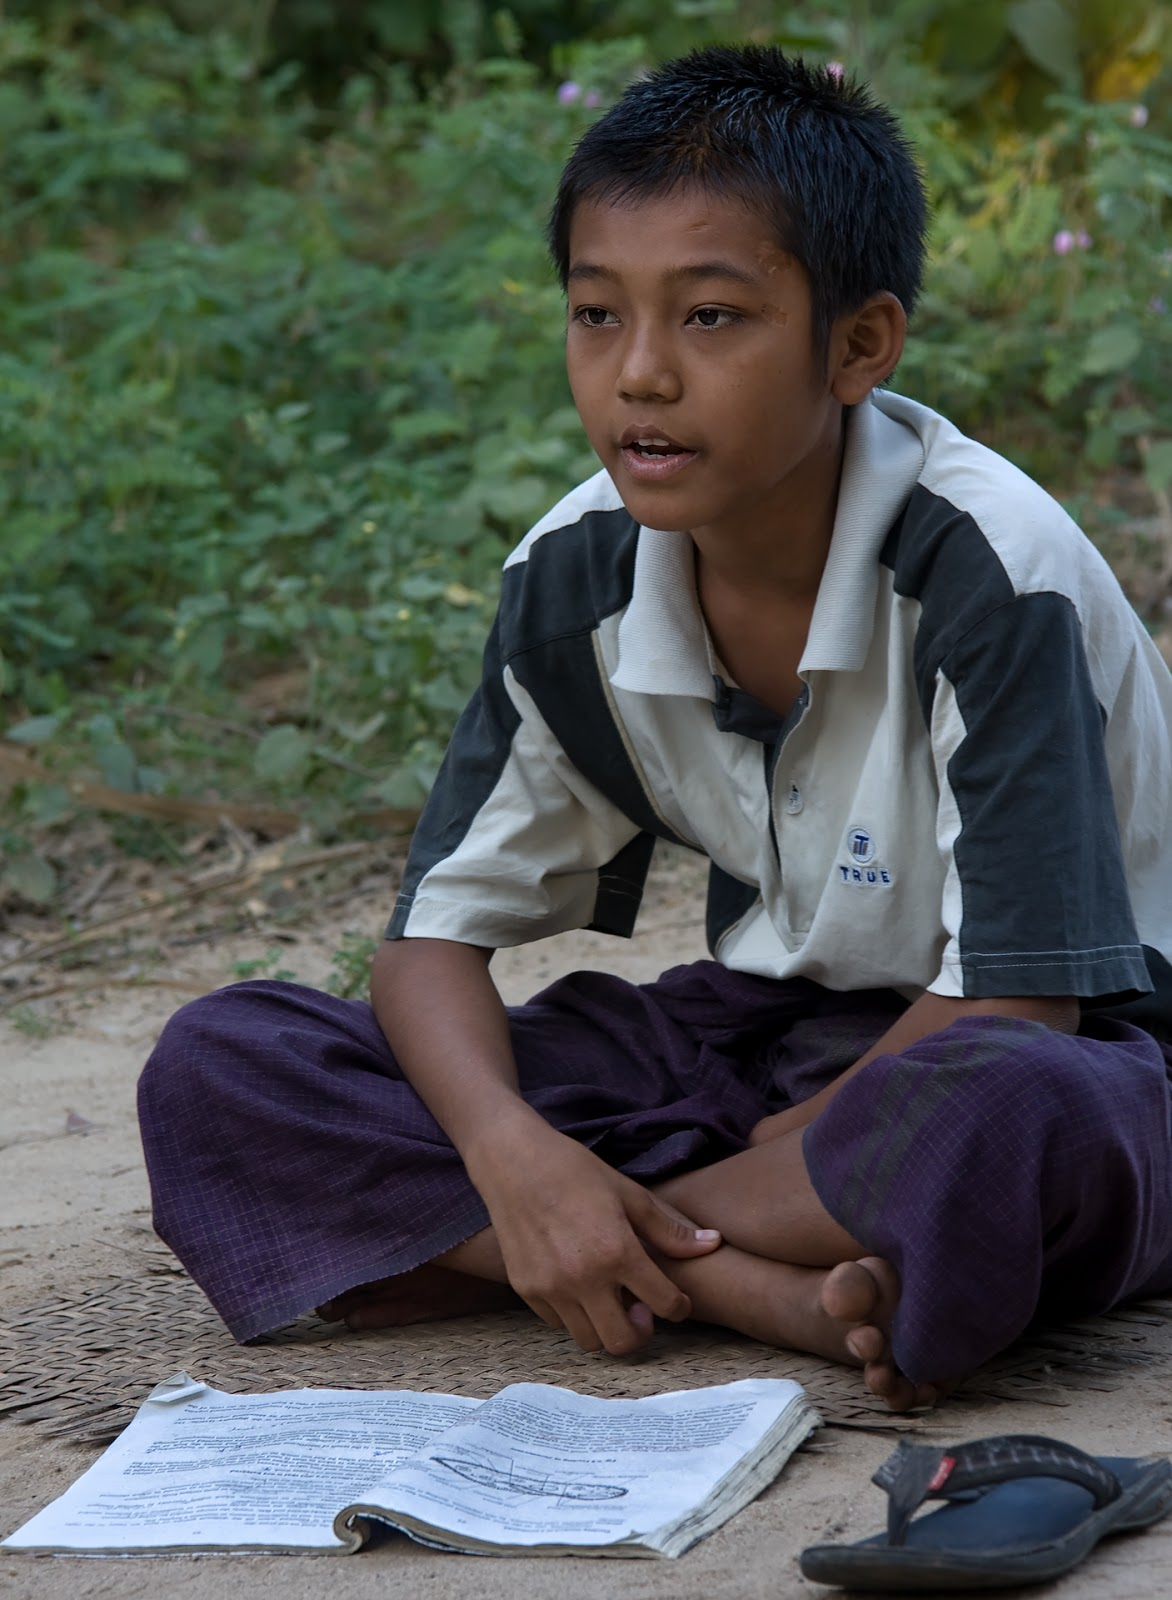 chłopiec,droga,zeszyt,bagan,birma